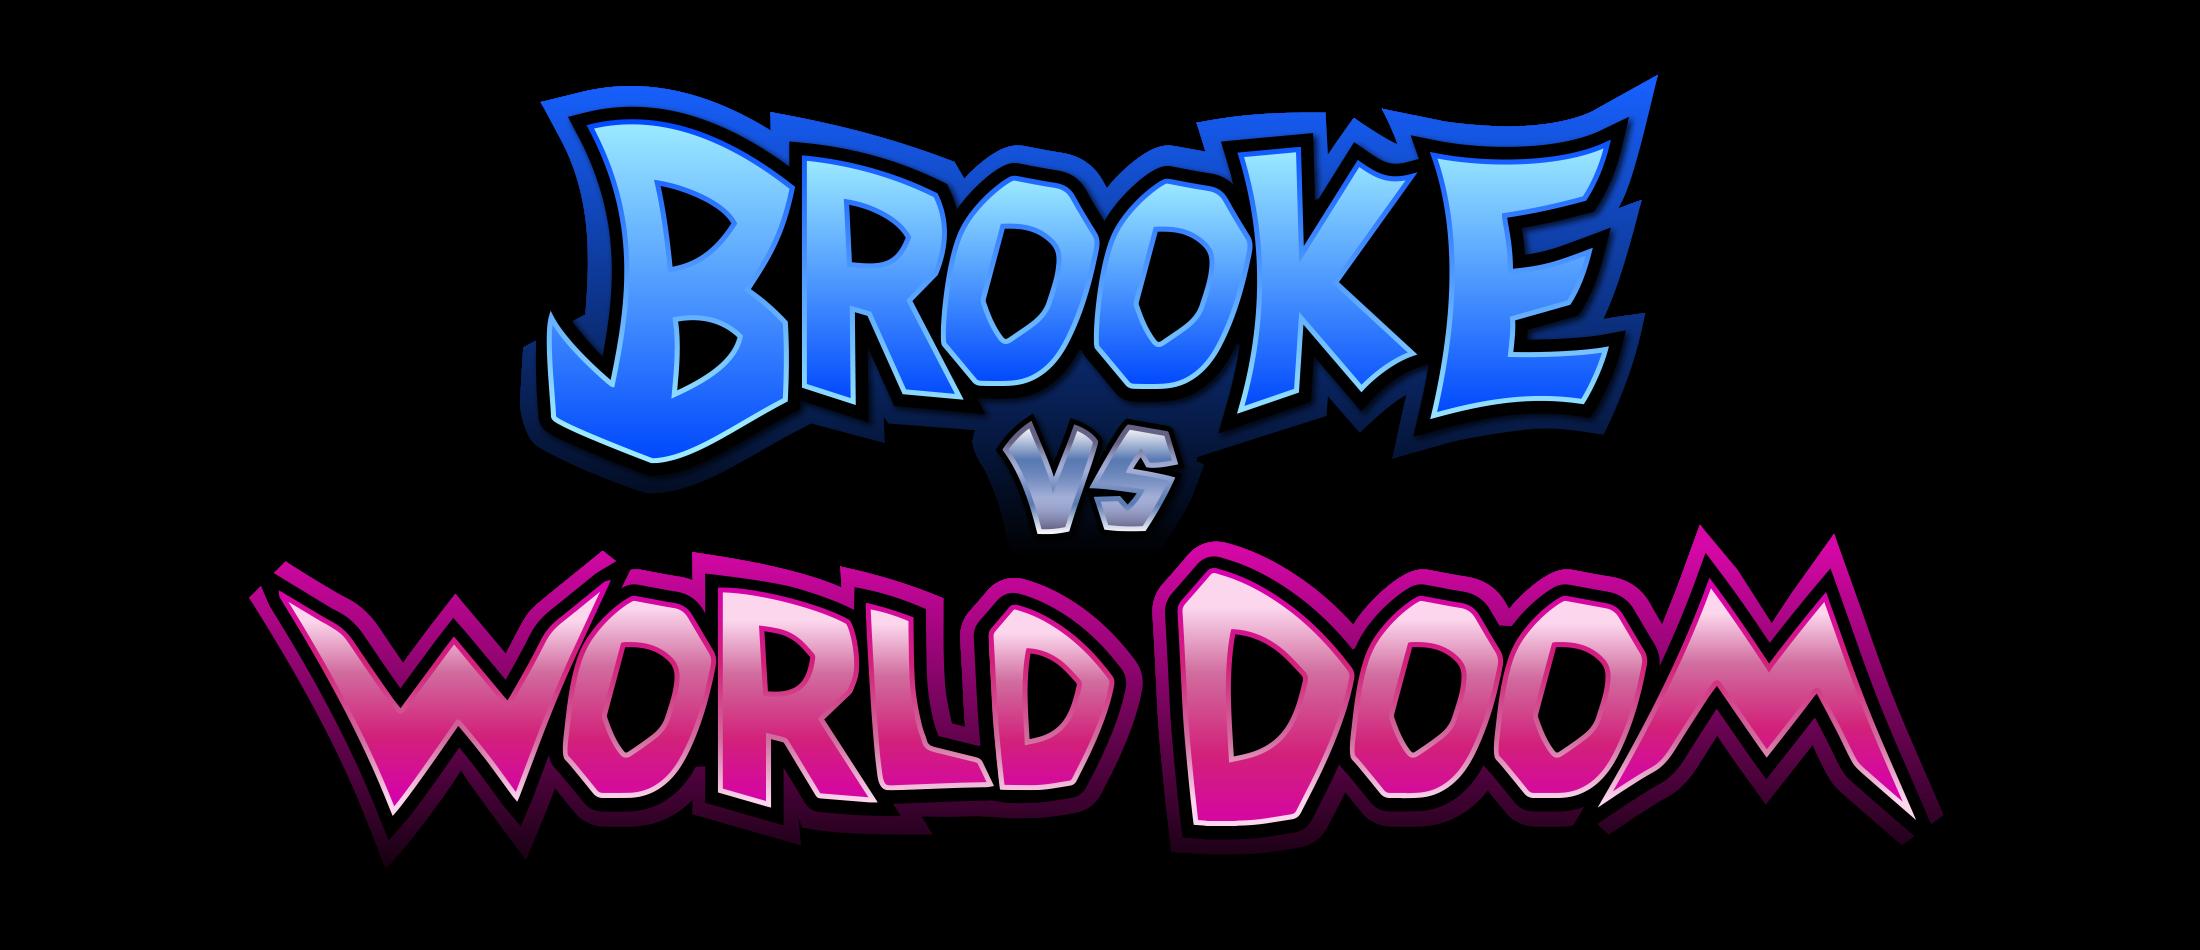 Brooke Vs. World Doom